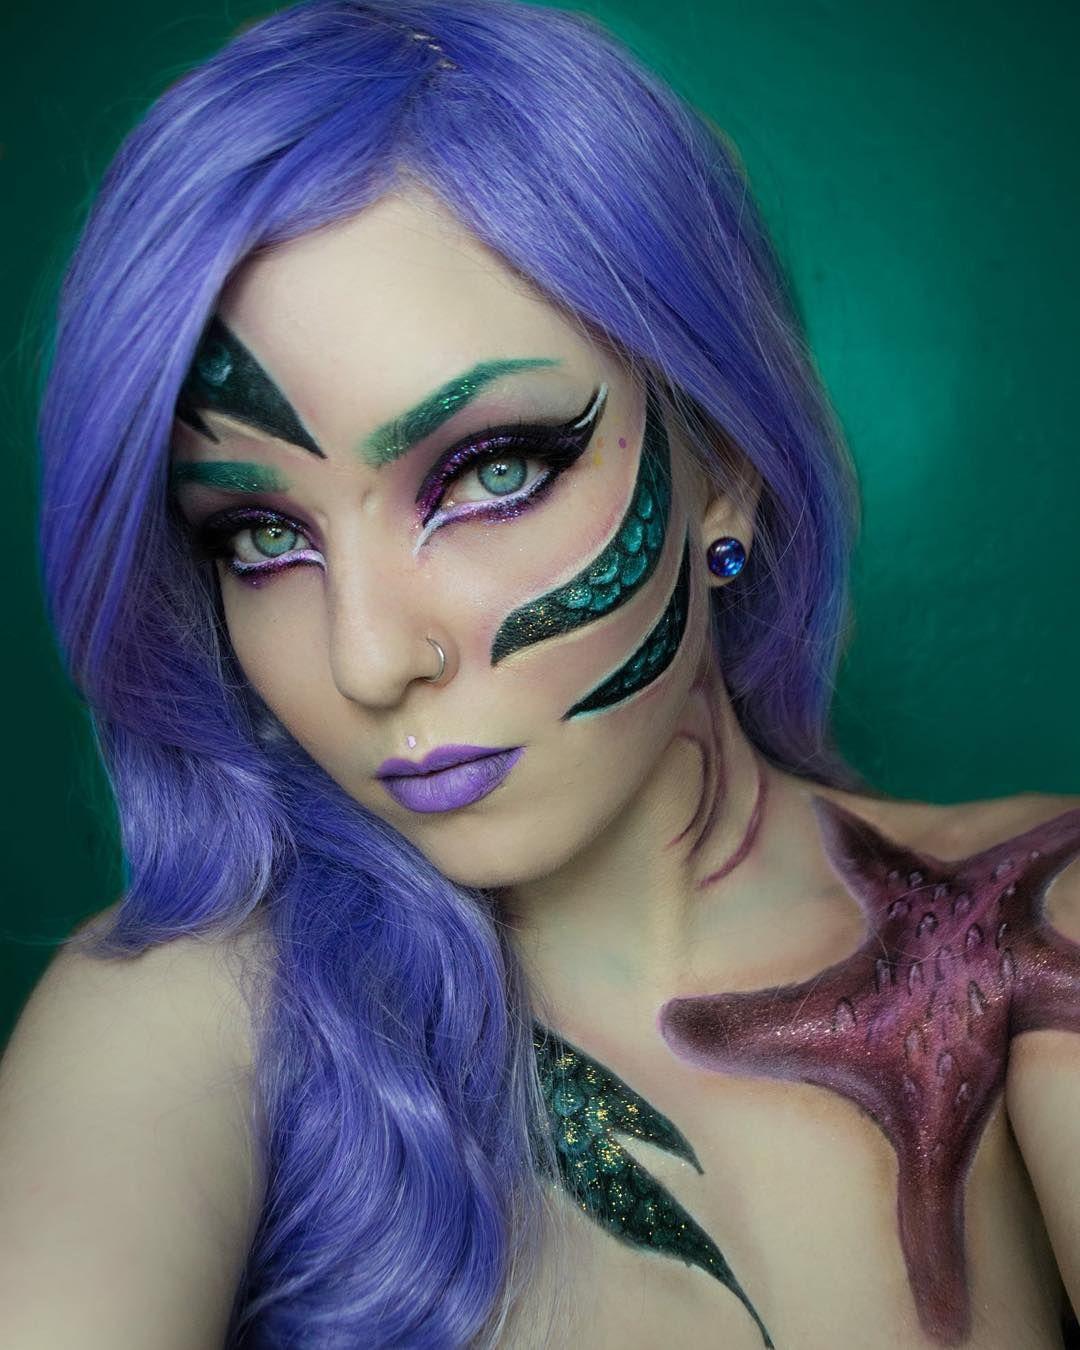 MERMAIDS AND MERMEN UNITE! Show me your best mermaid looks using ...